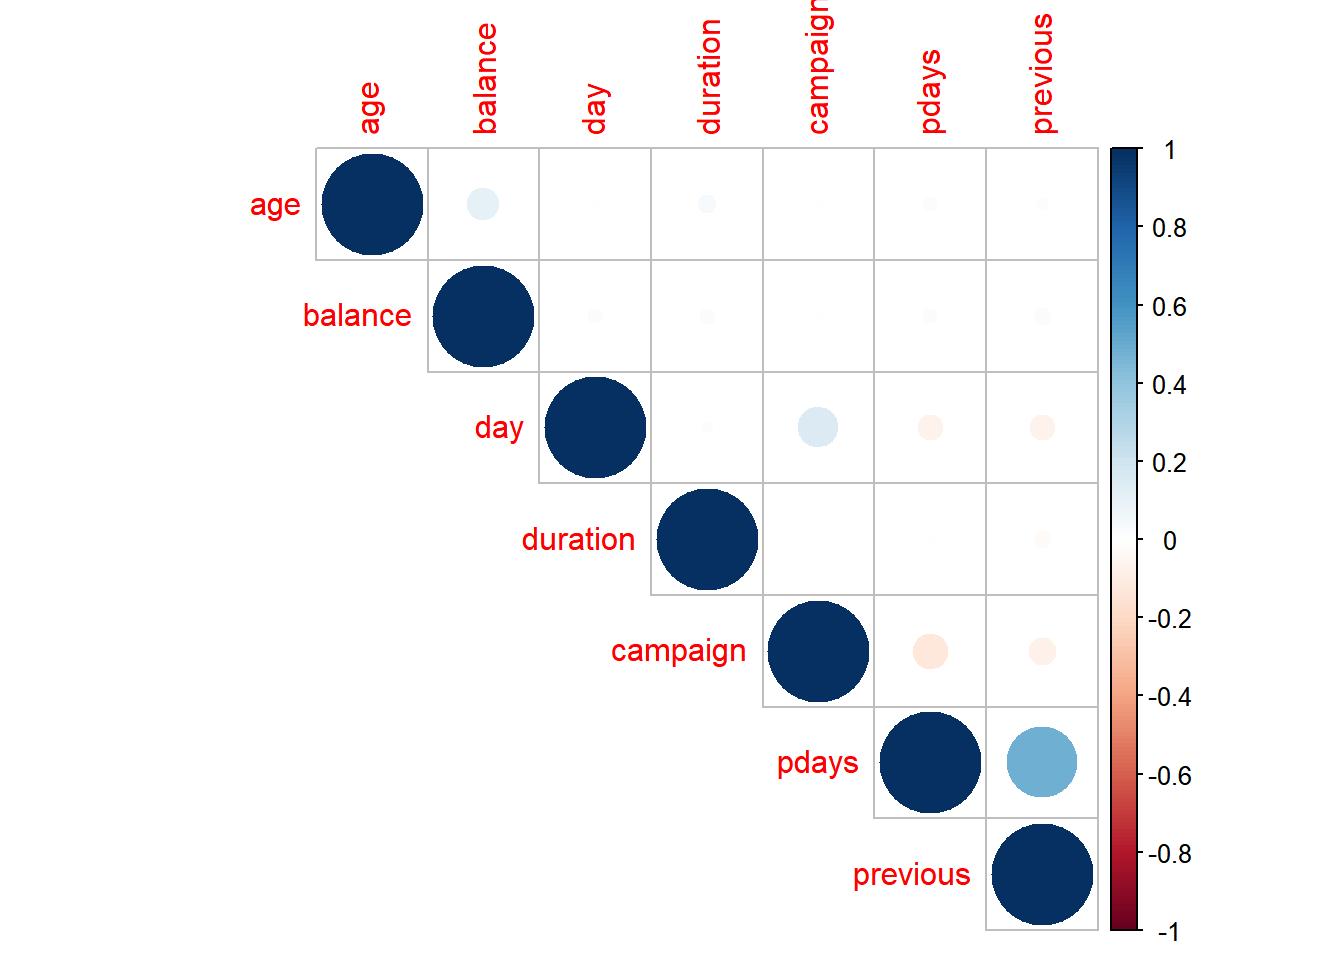 Correlation between numerical predictors.